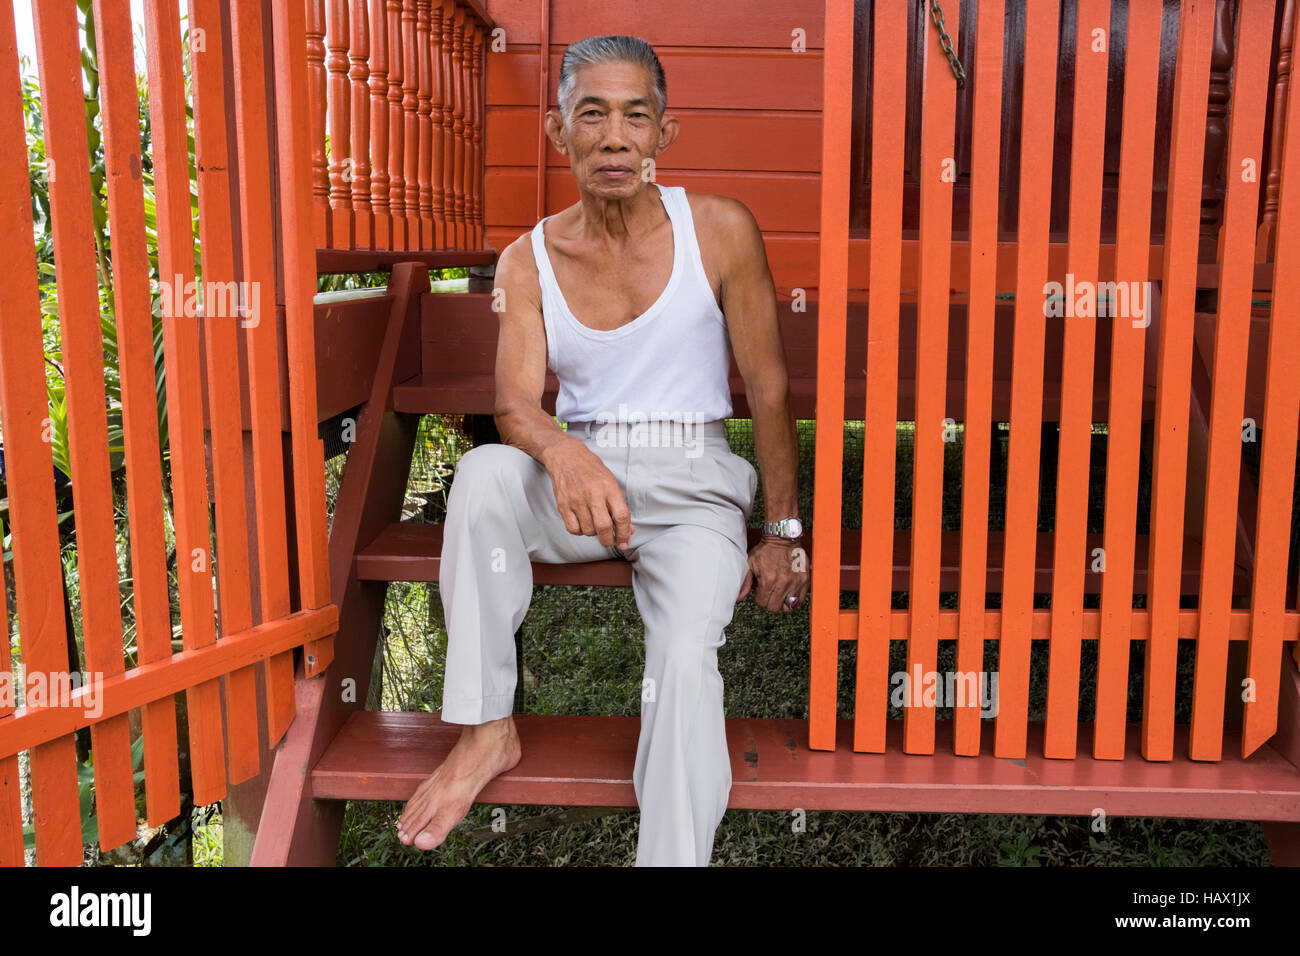 Johari Bin Kahar 70, sits on the steps of his house in Kampong Brunei, Dalat, Mukah Division, Sarawak, Malaysia - Stock Image